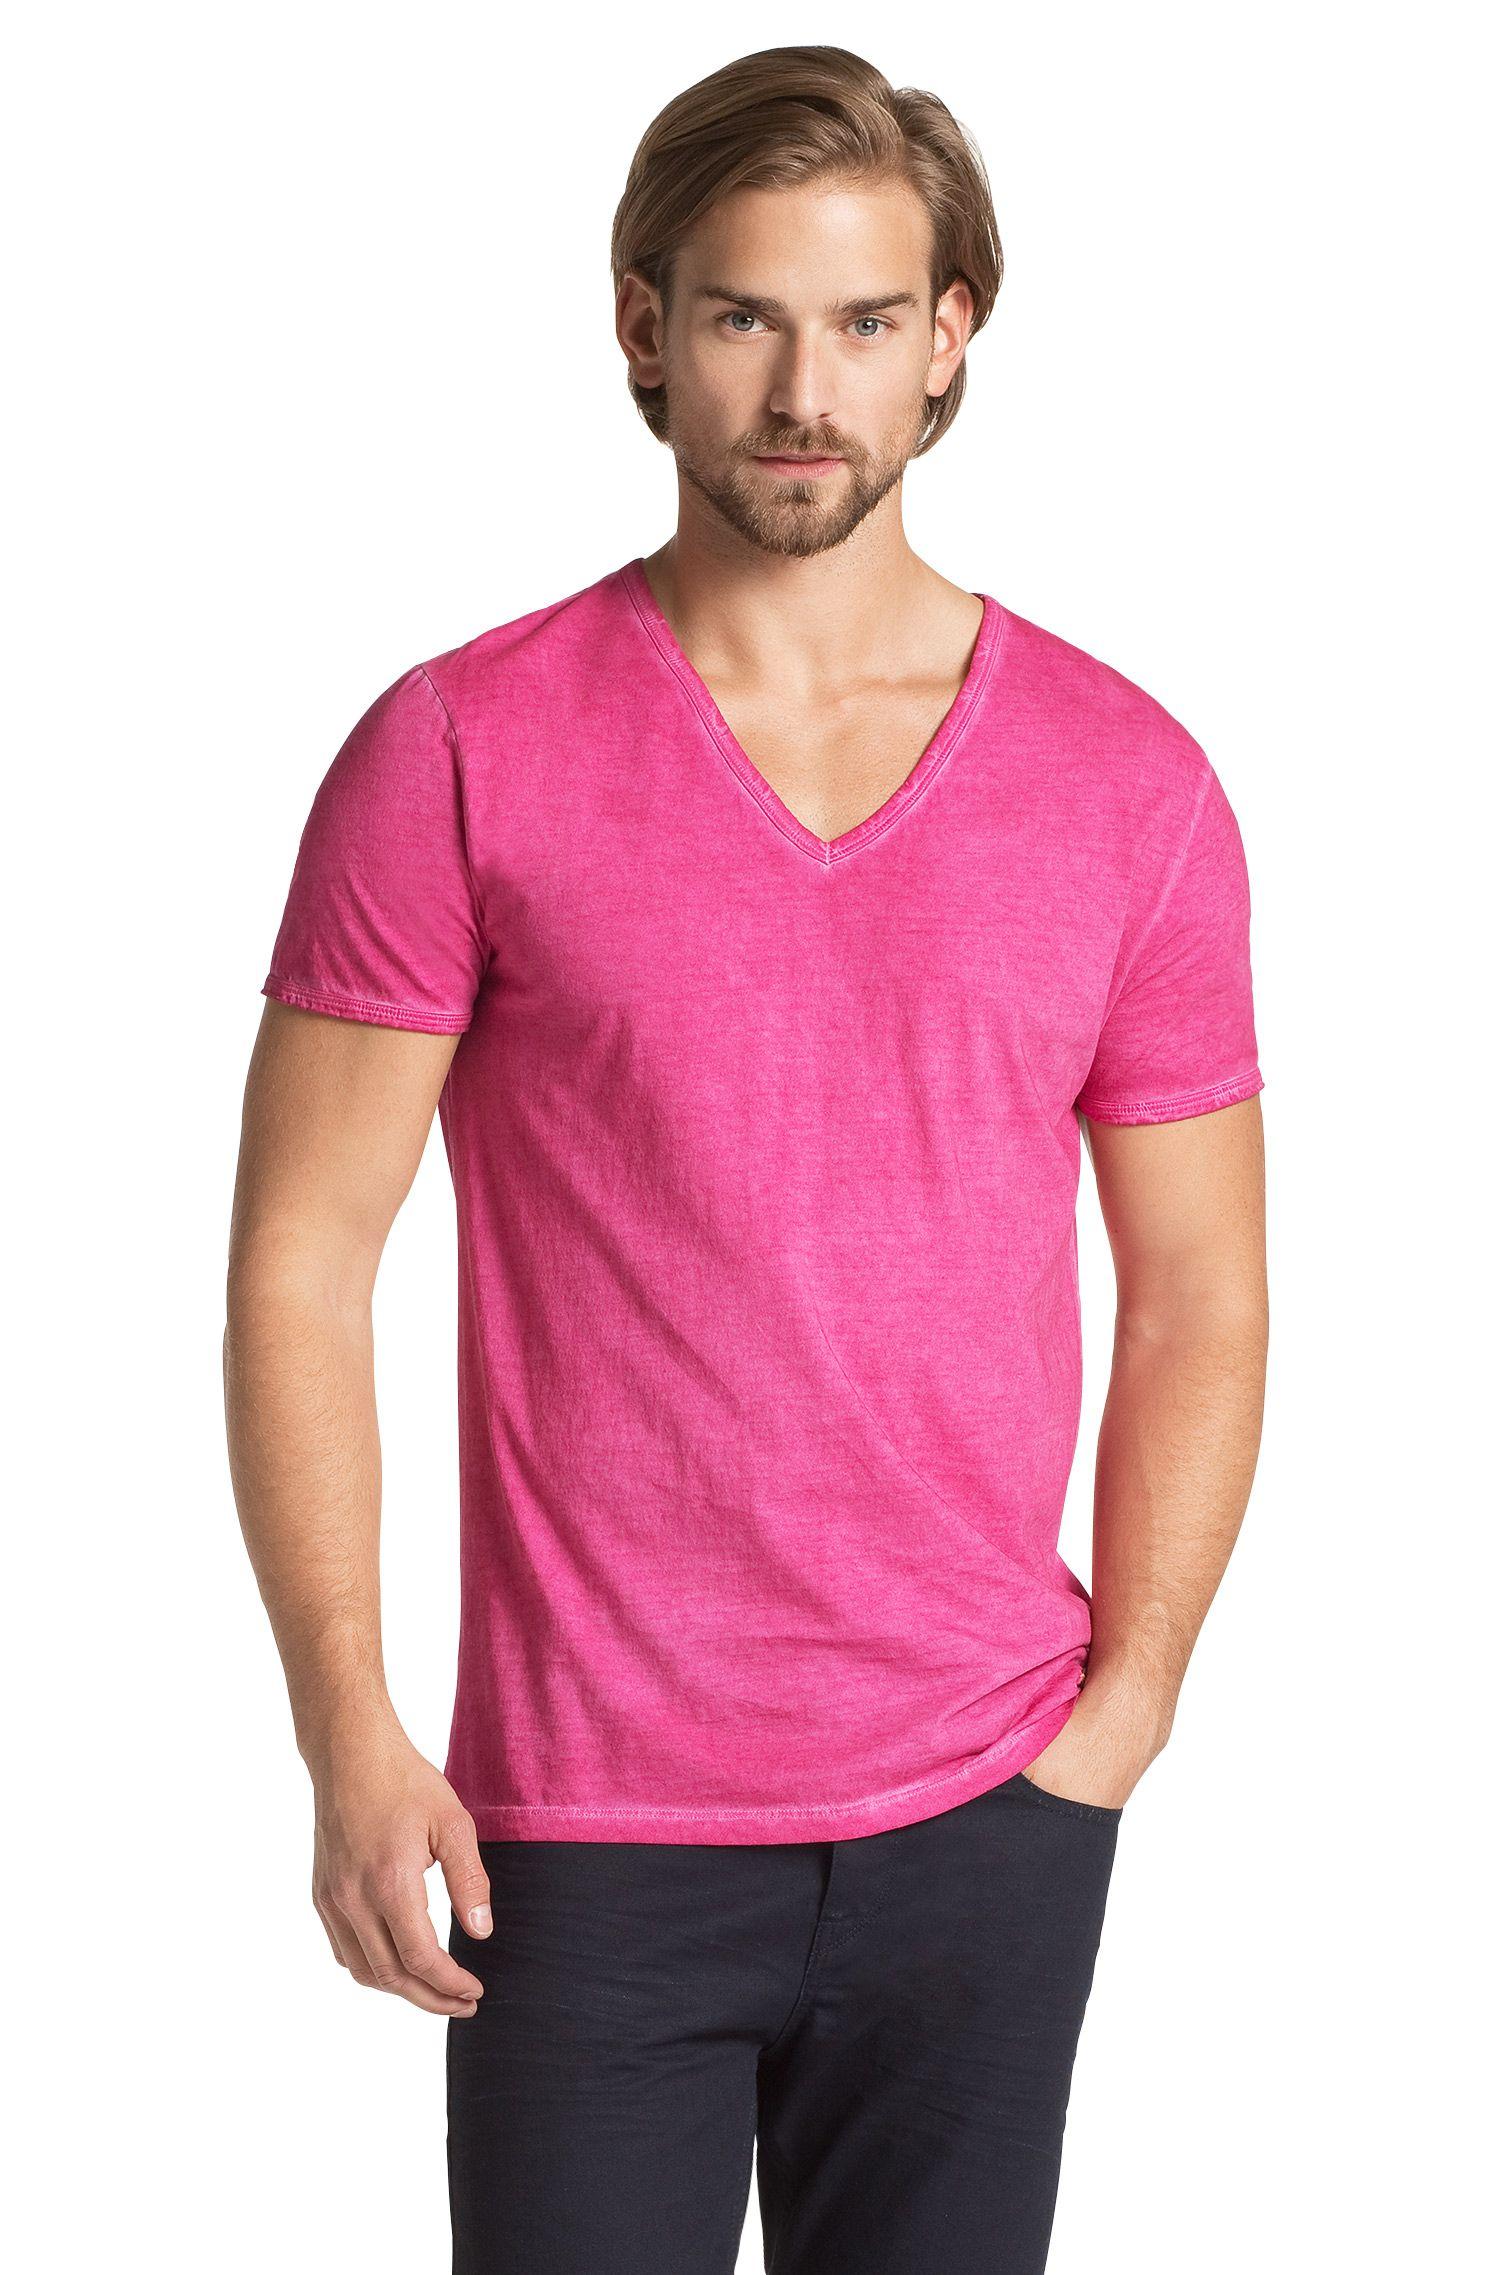 T-shirt ´Toulouse` met V-hals, van BOSS Orange